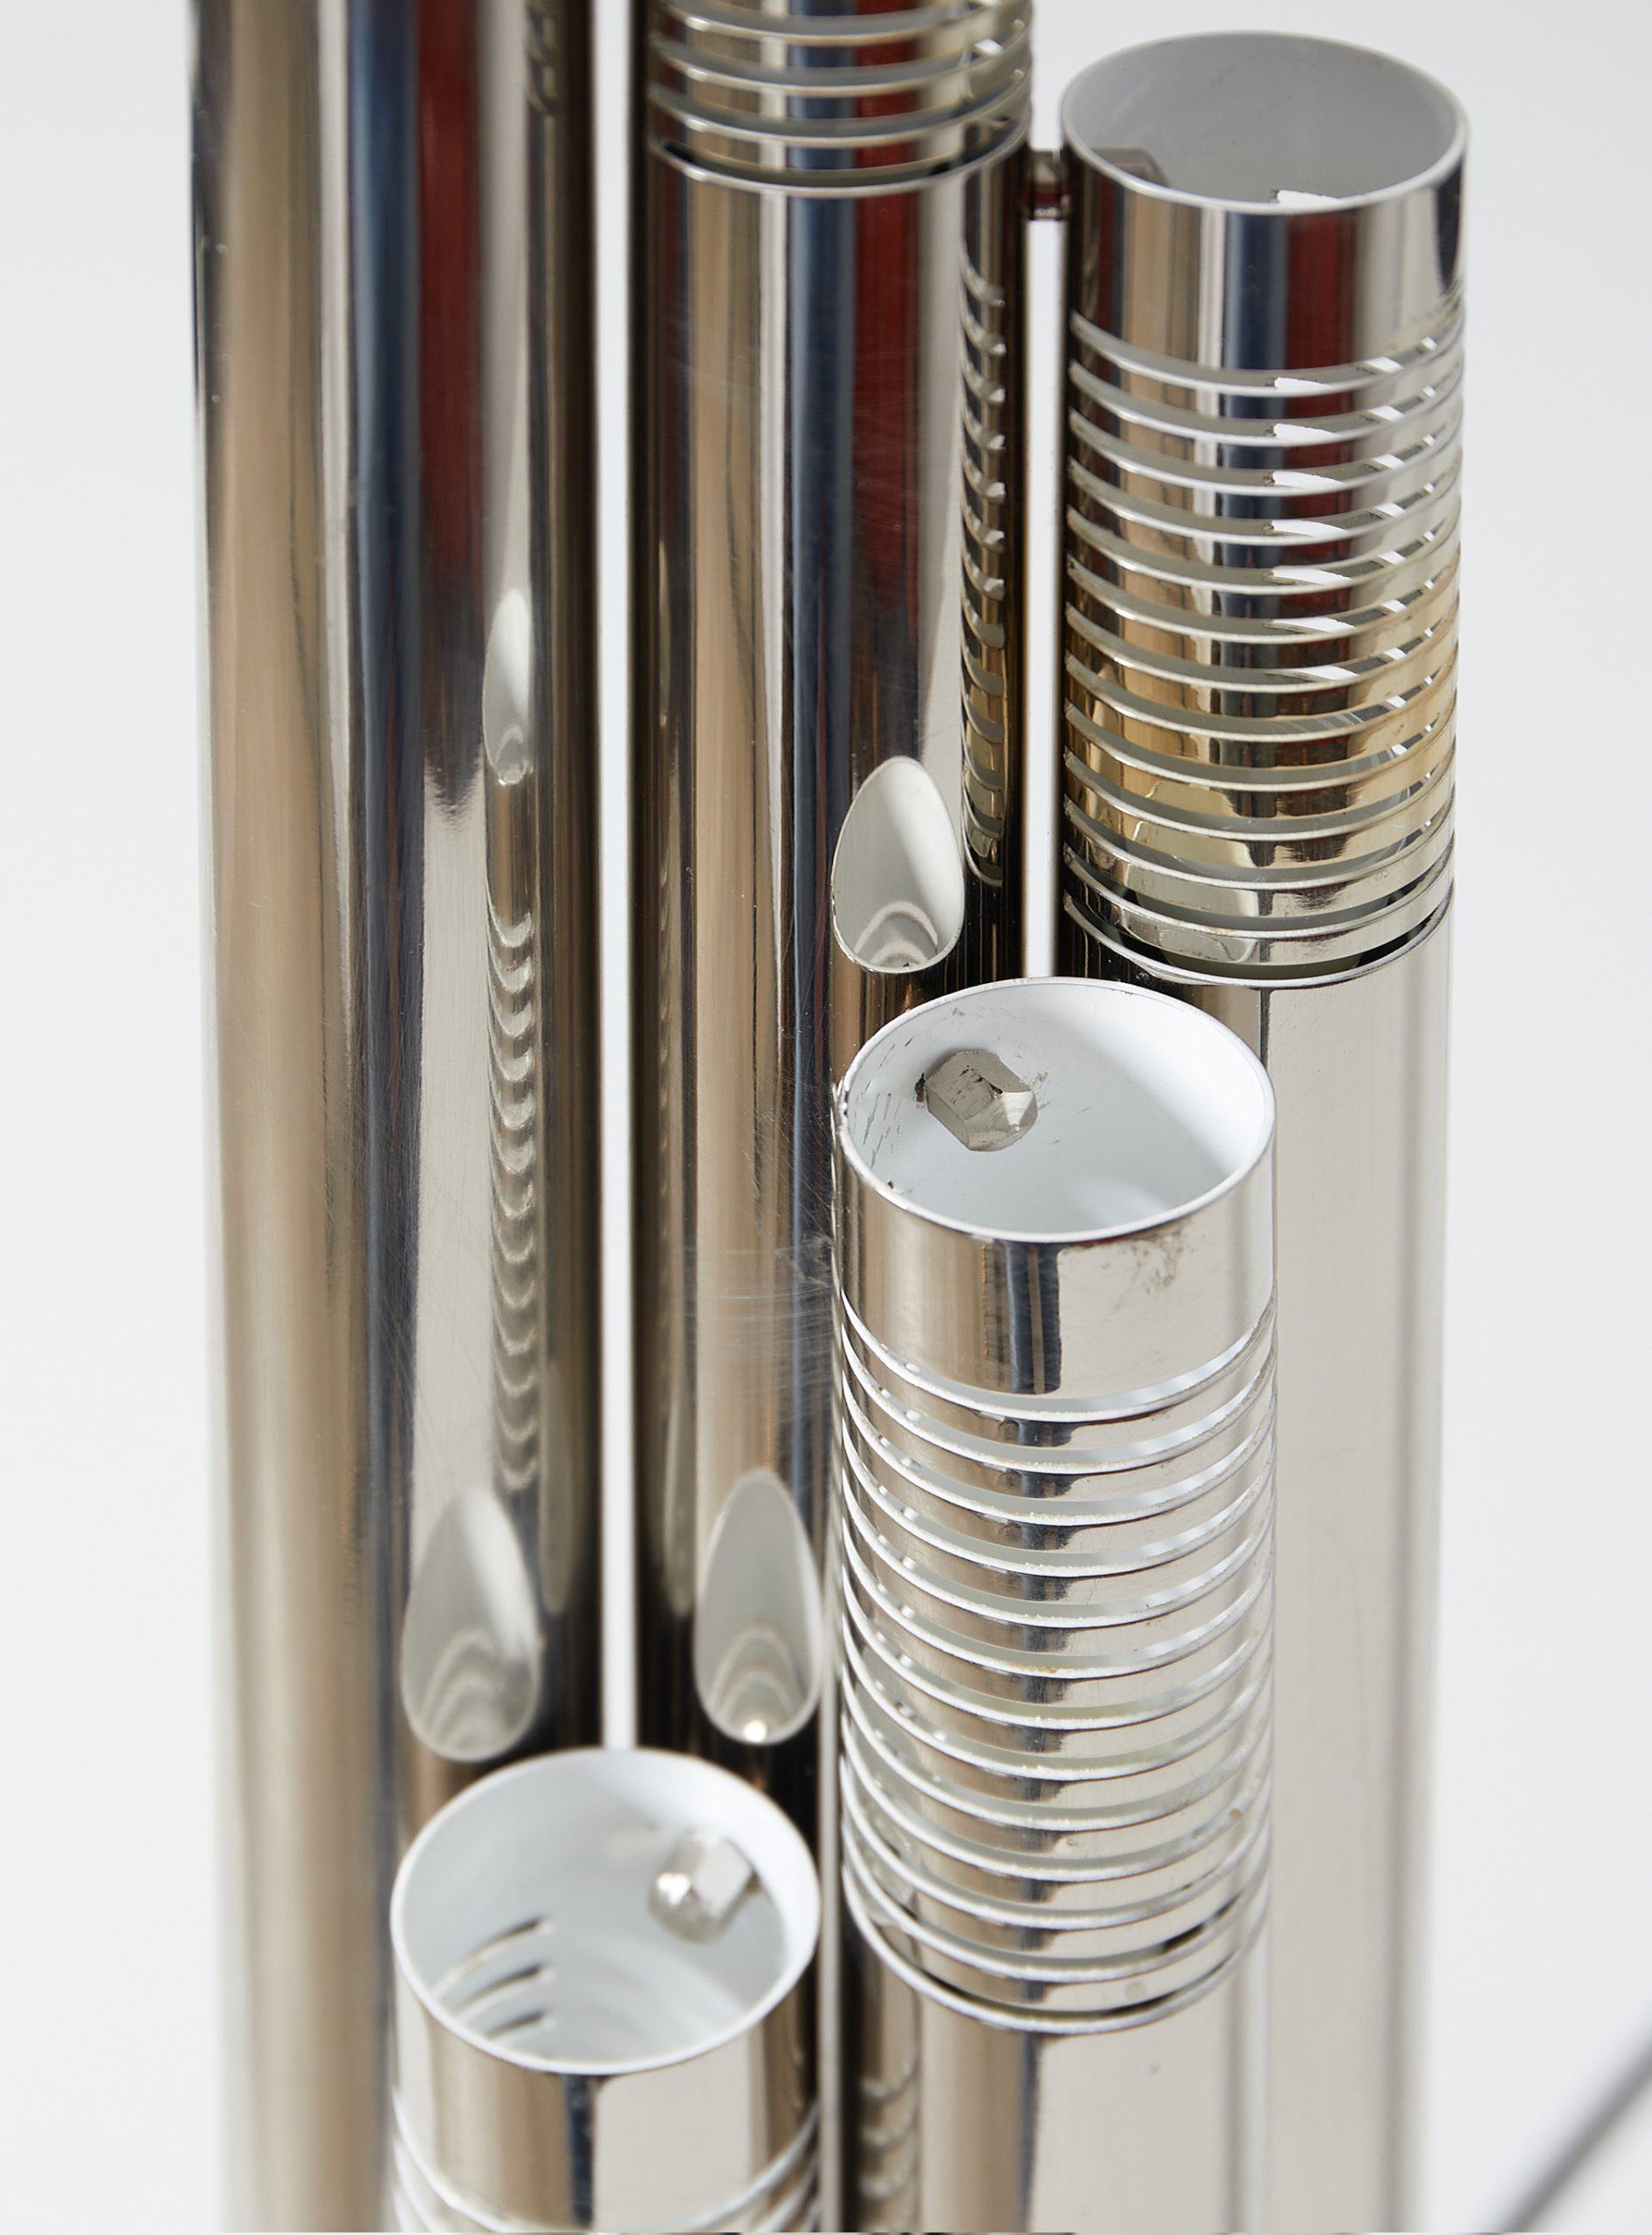 italian-chromed-metal-tubular-table-lamp-c-1970-image-05